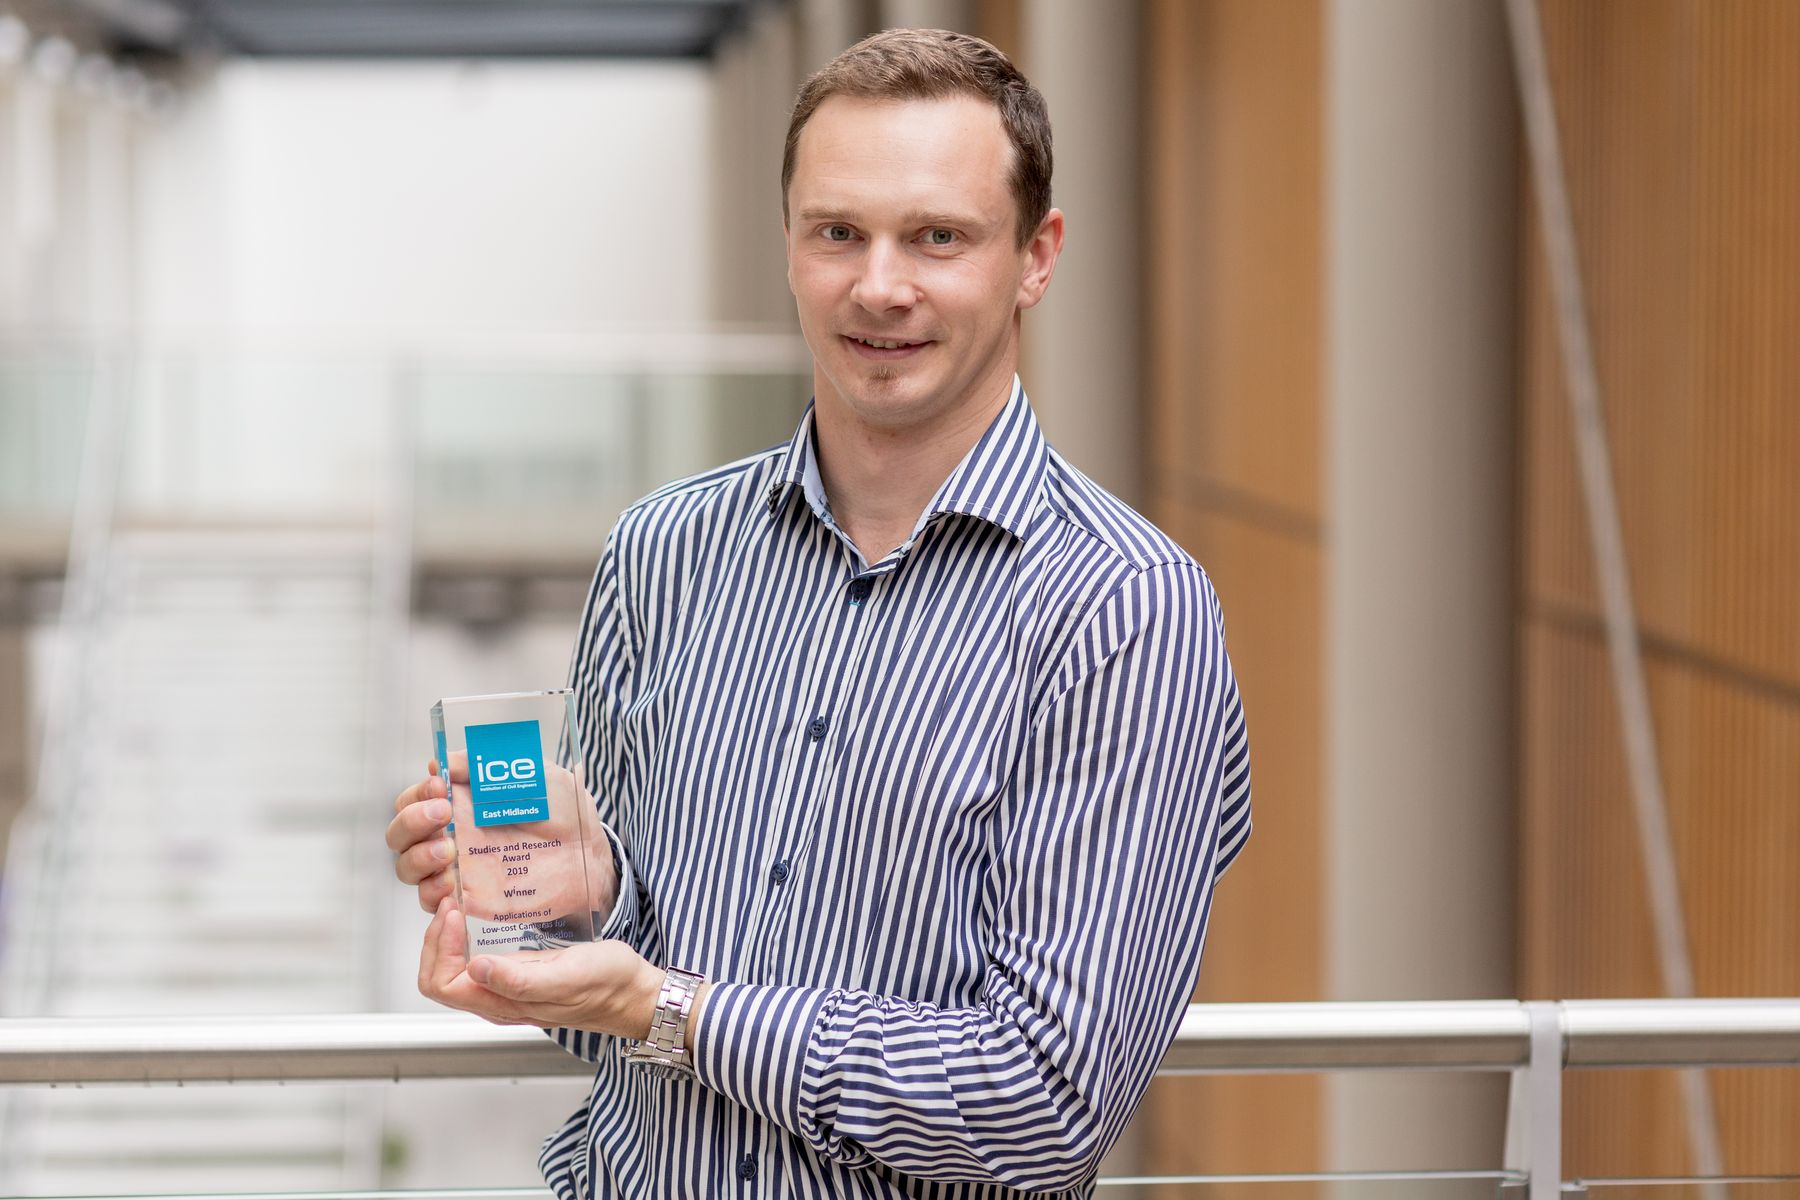 Professor Rolands holding ICE award